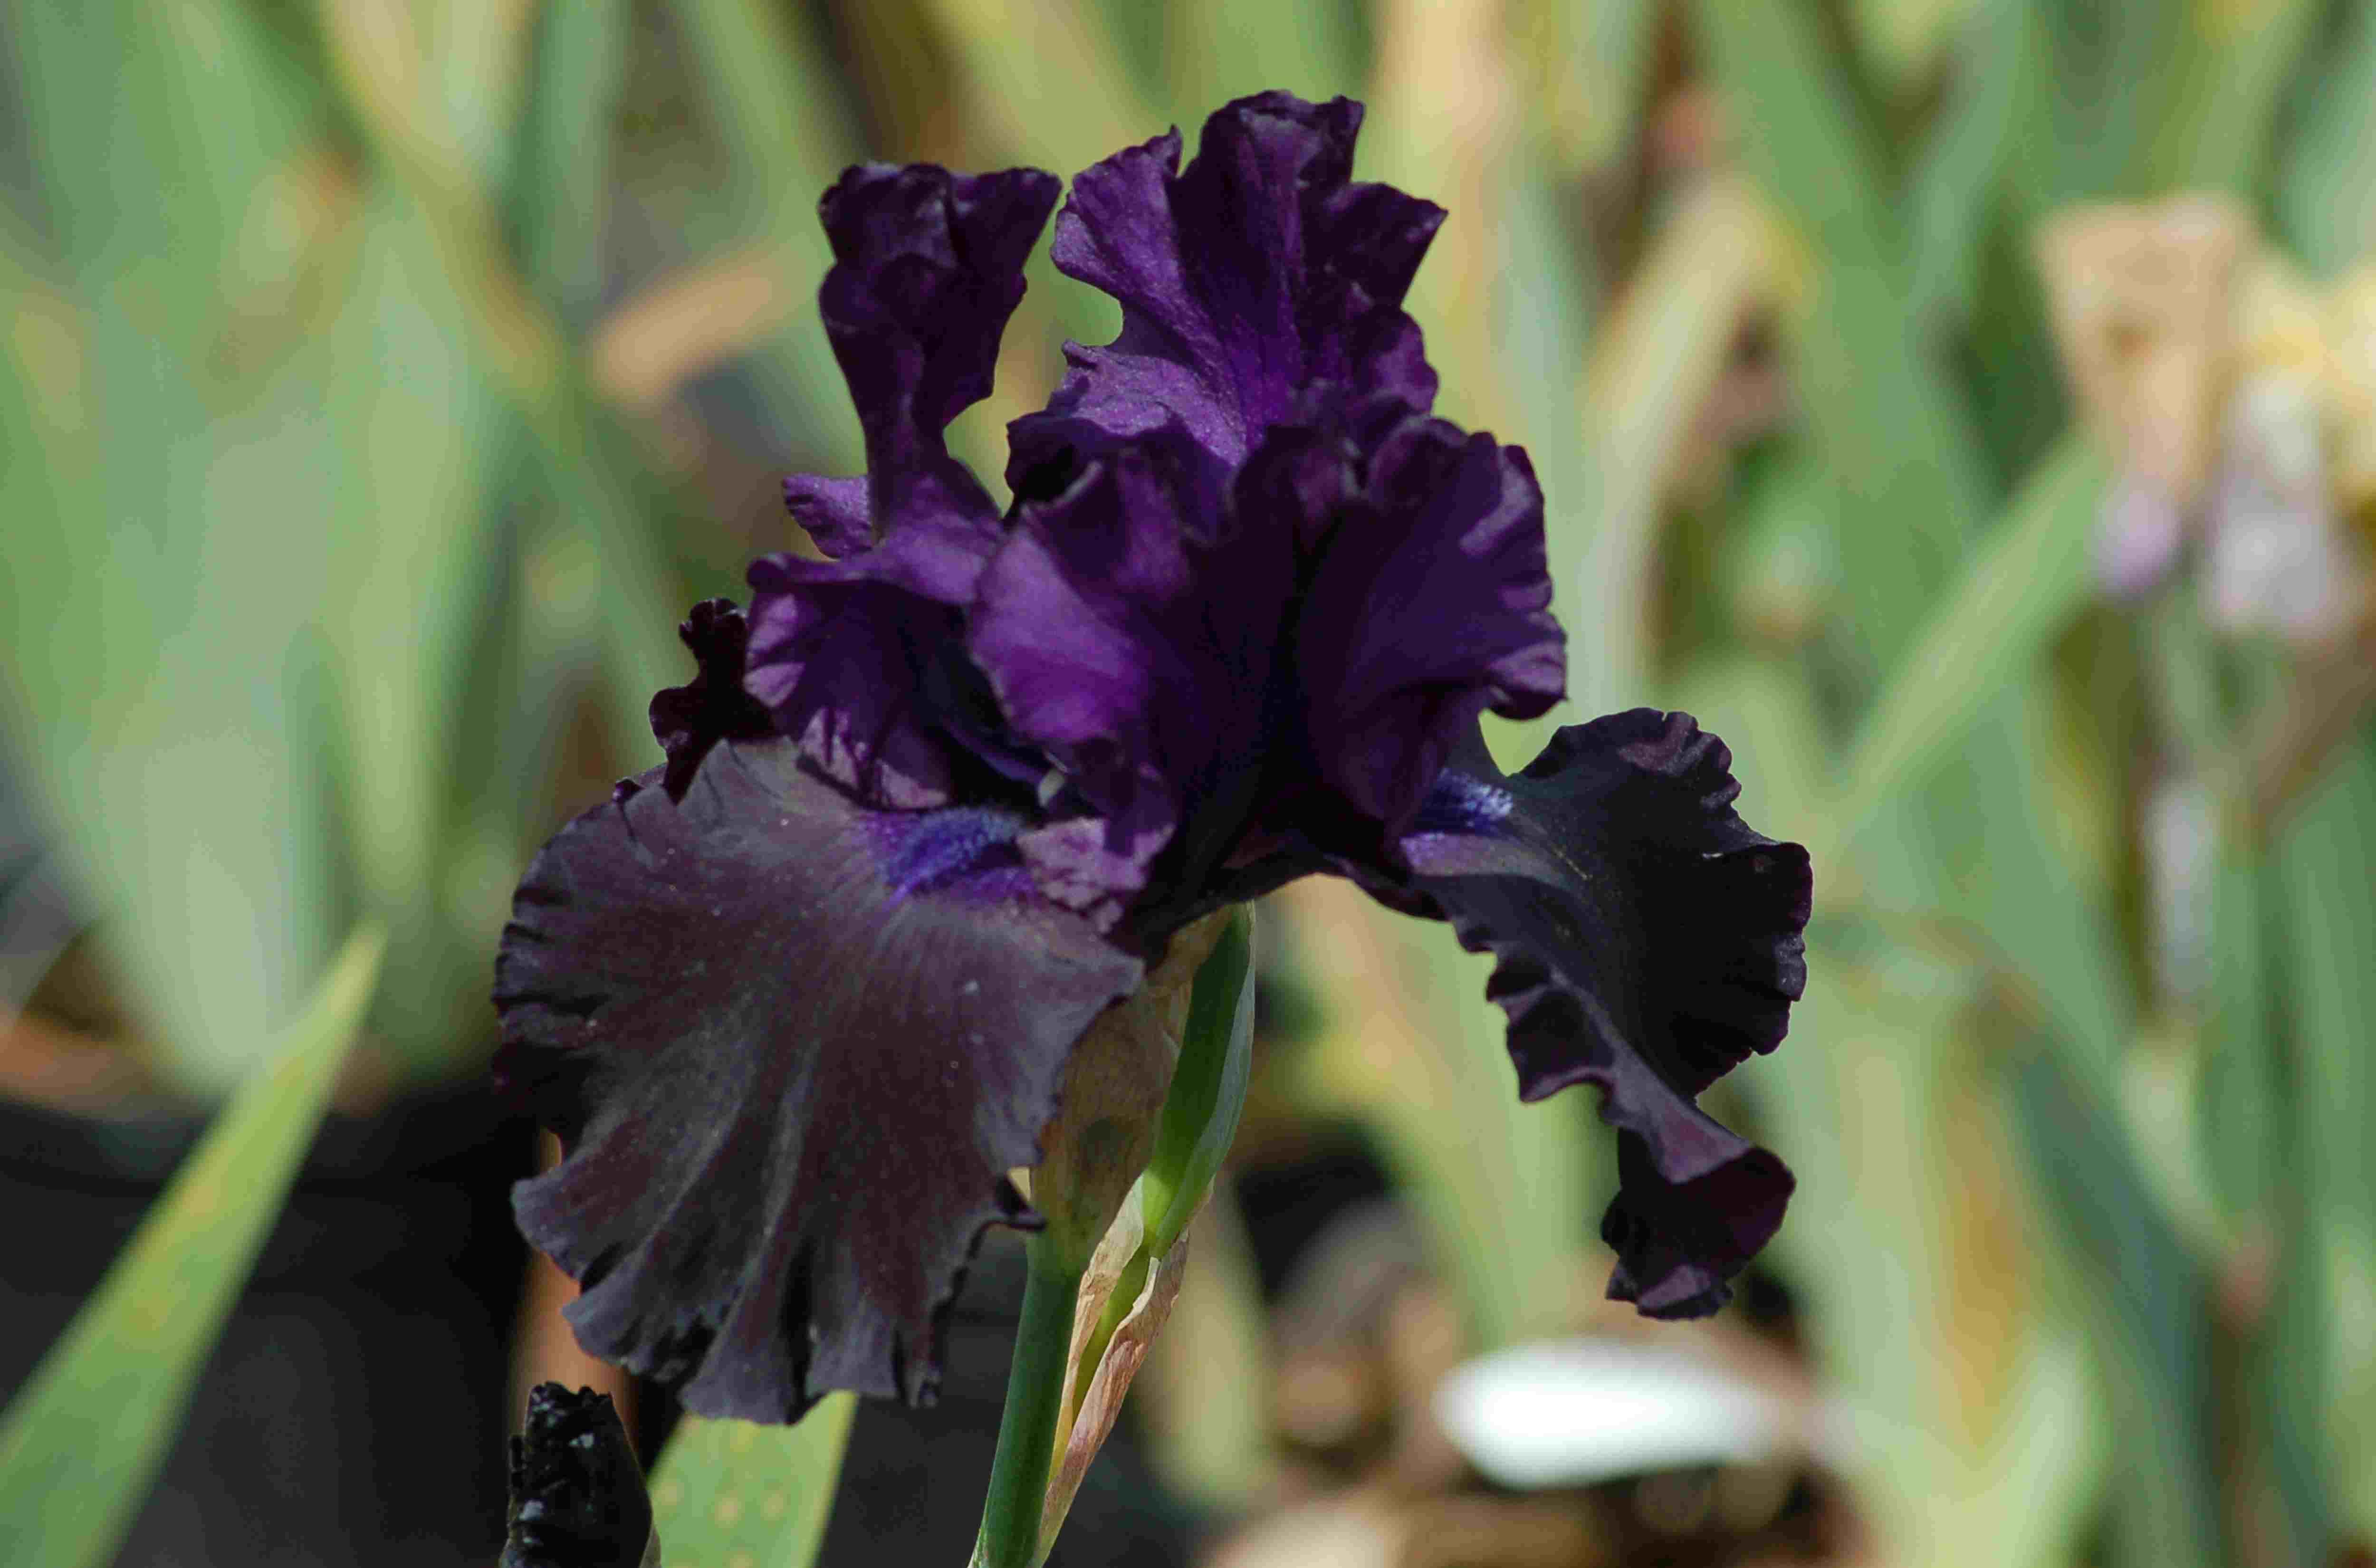 Deer resistant perennials plants bambi wont eat image black iris izmirmasajfo